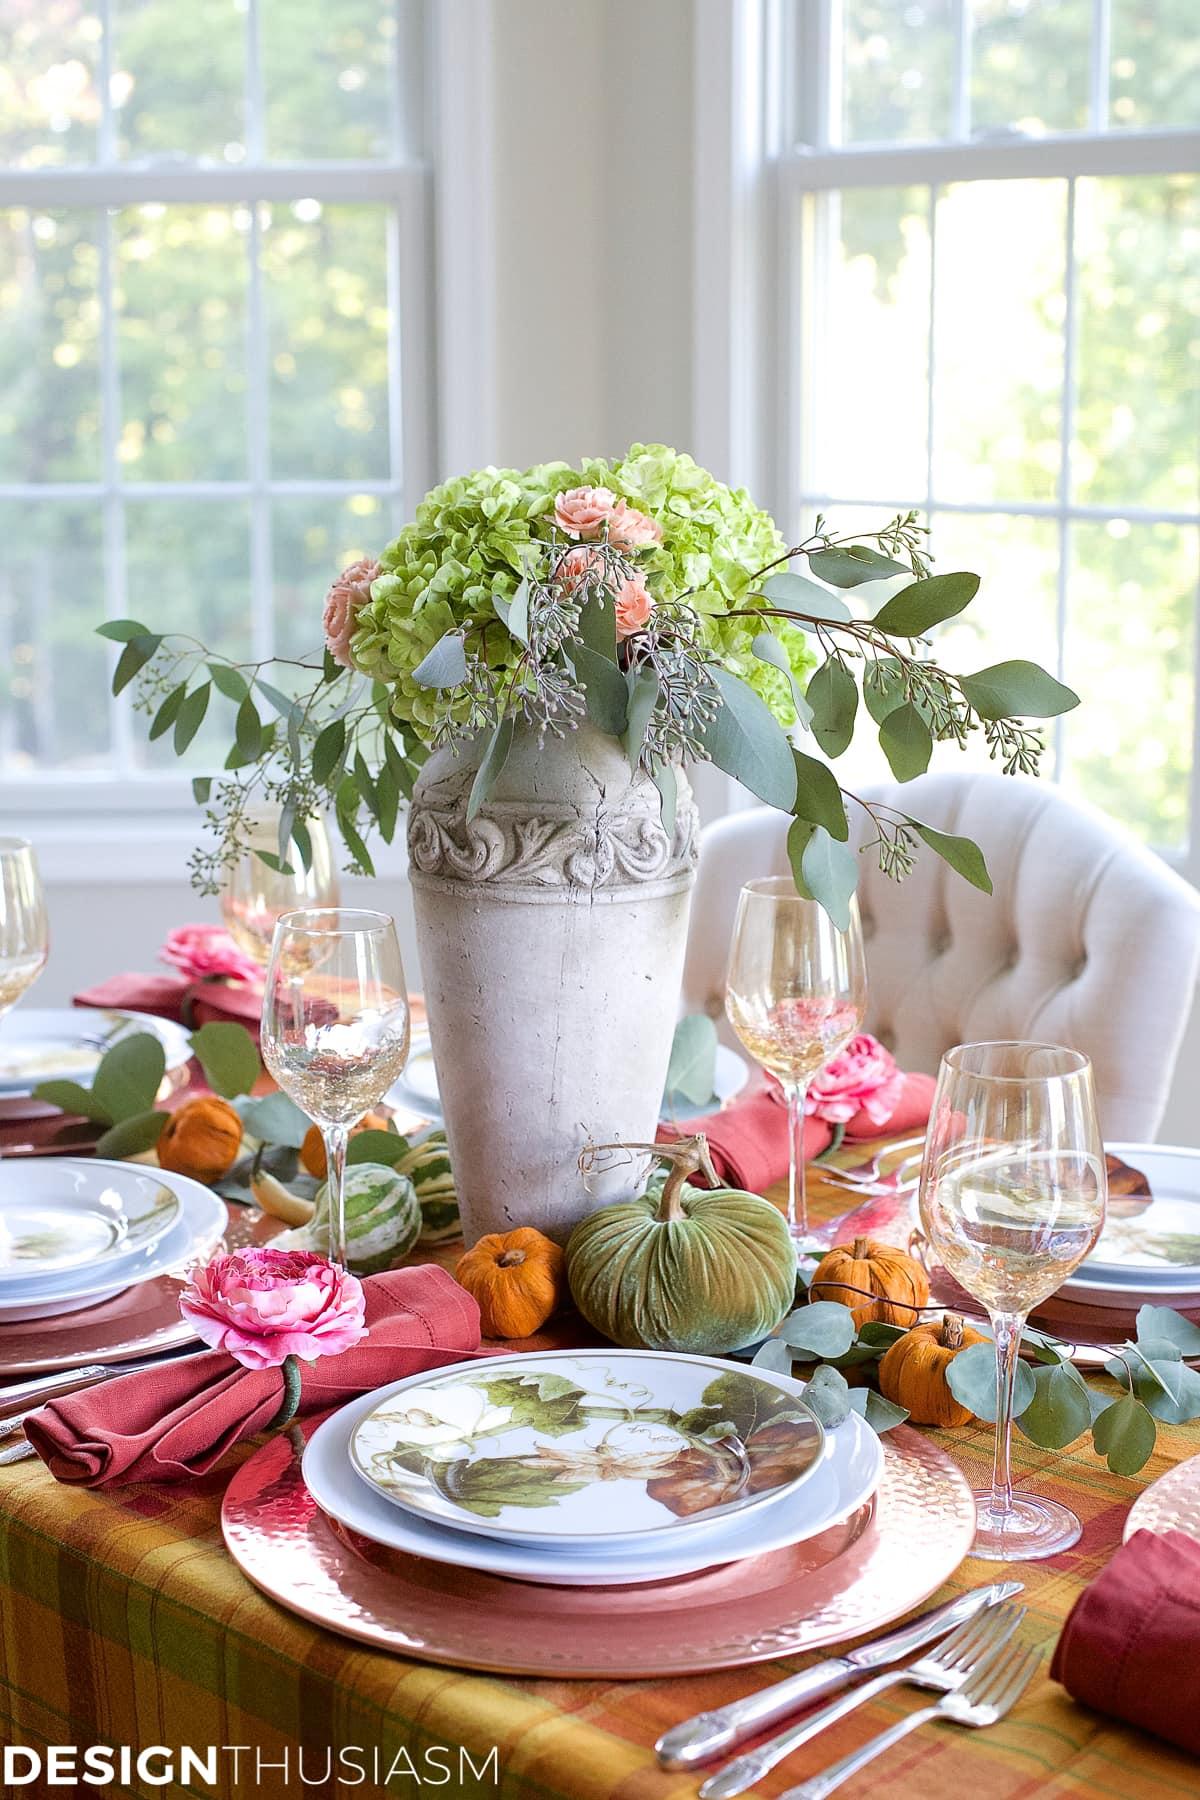 A Year of Seasonal Tablescapes Designthusiasm.com